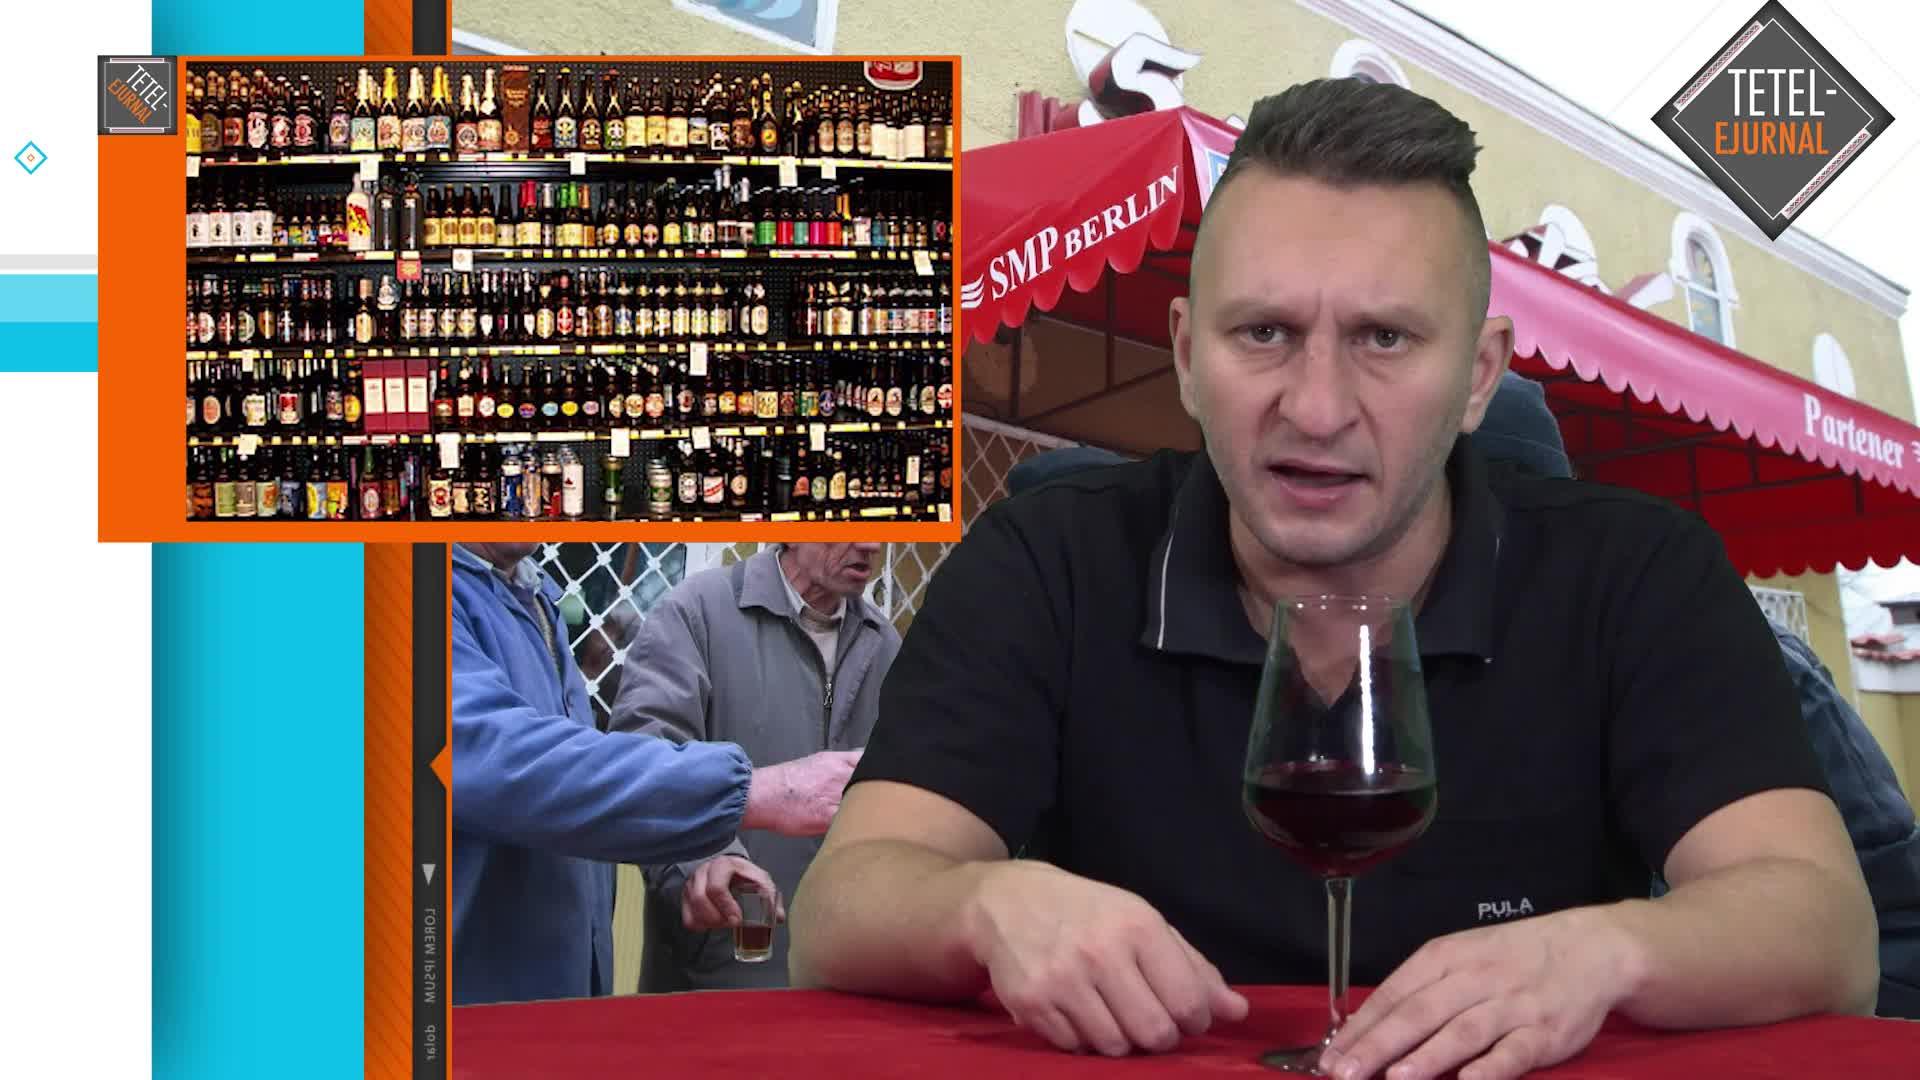 Tetelejurnal: Alcool